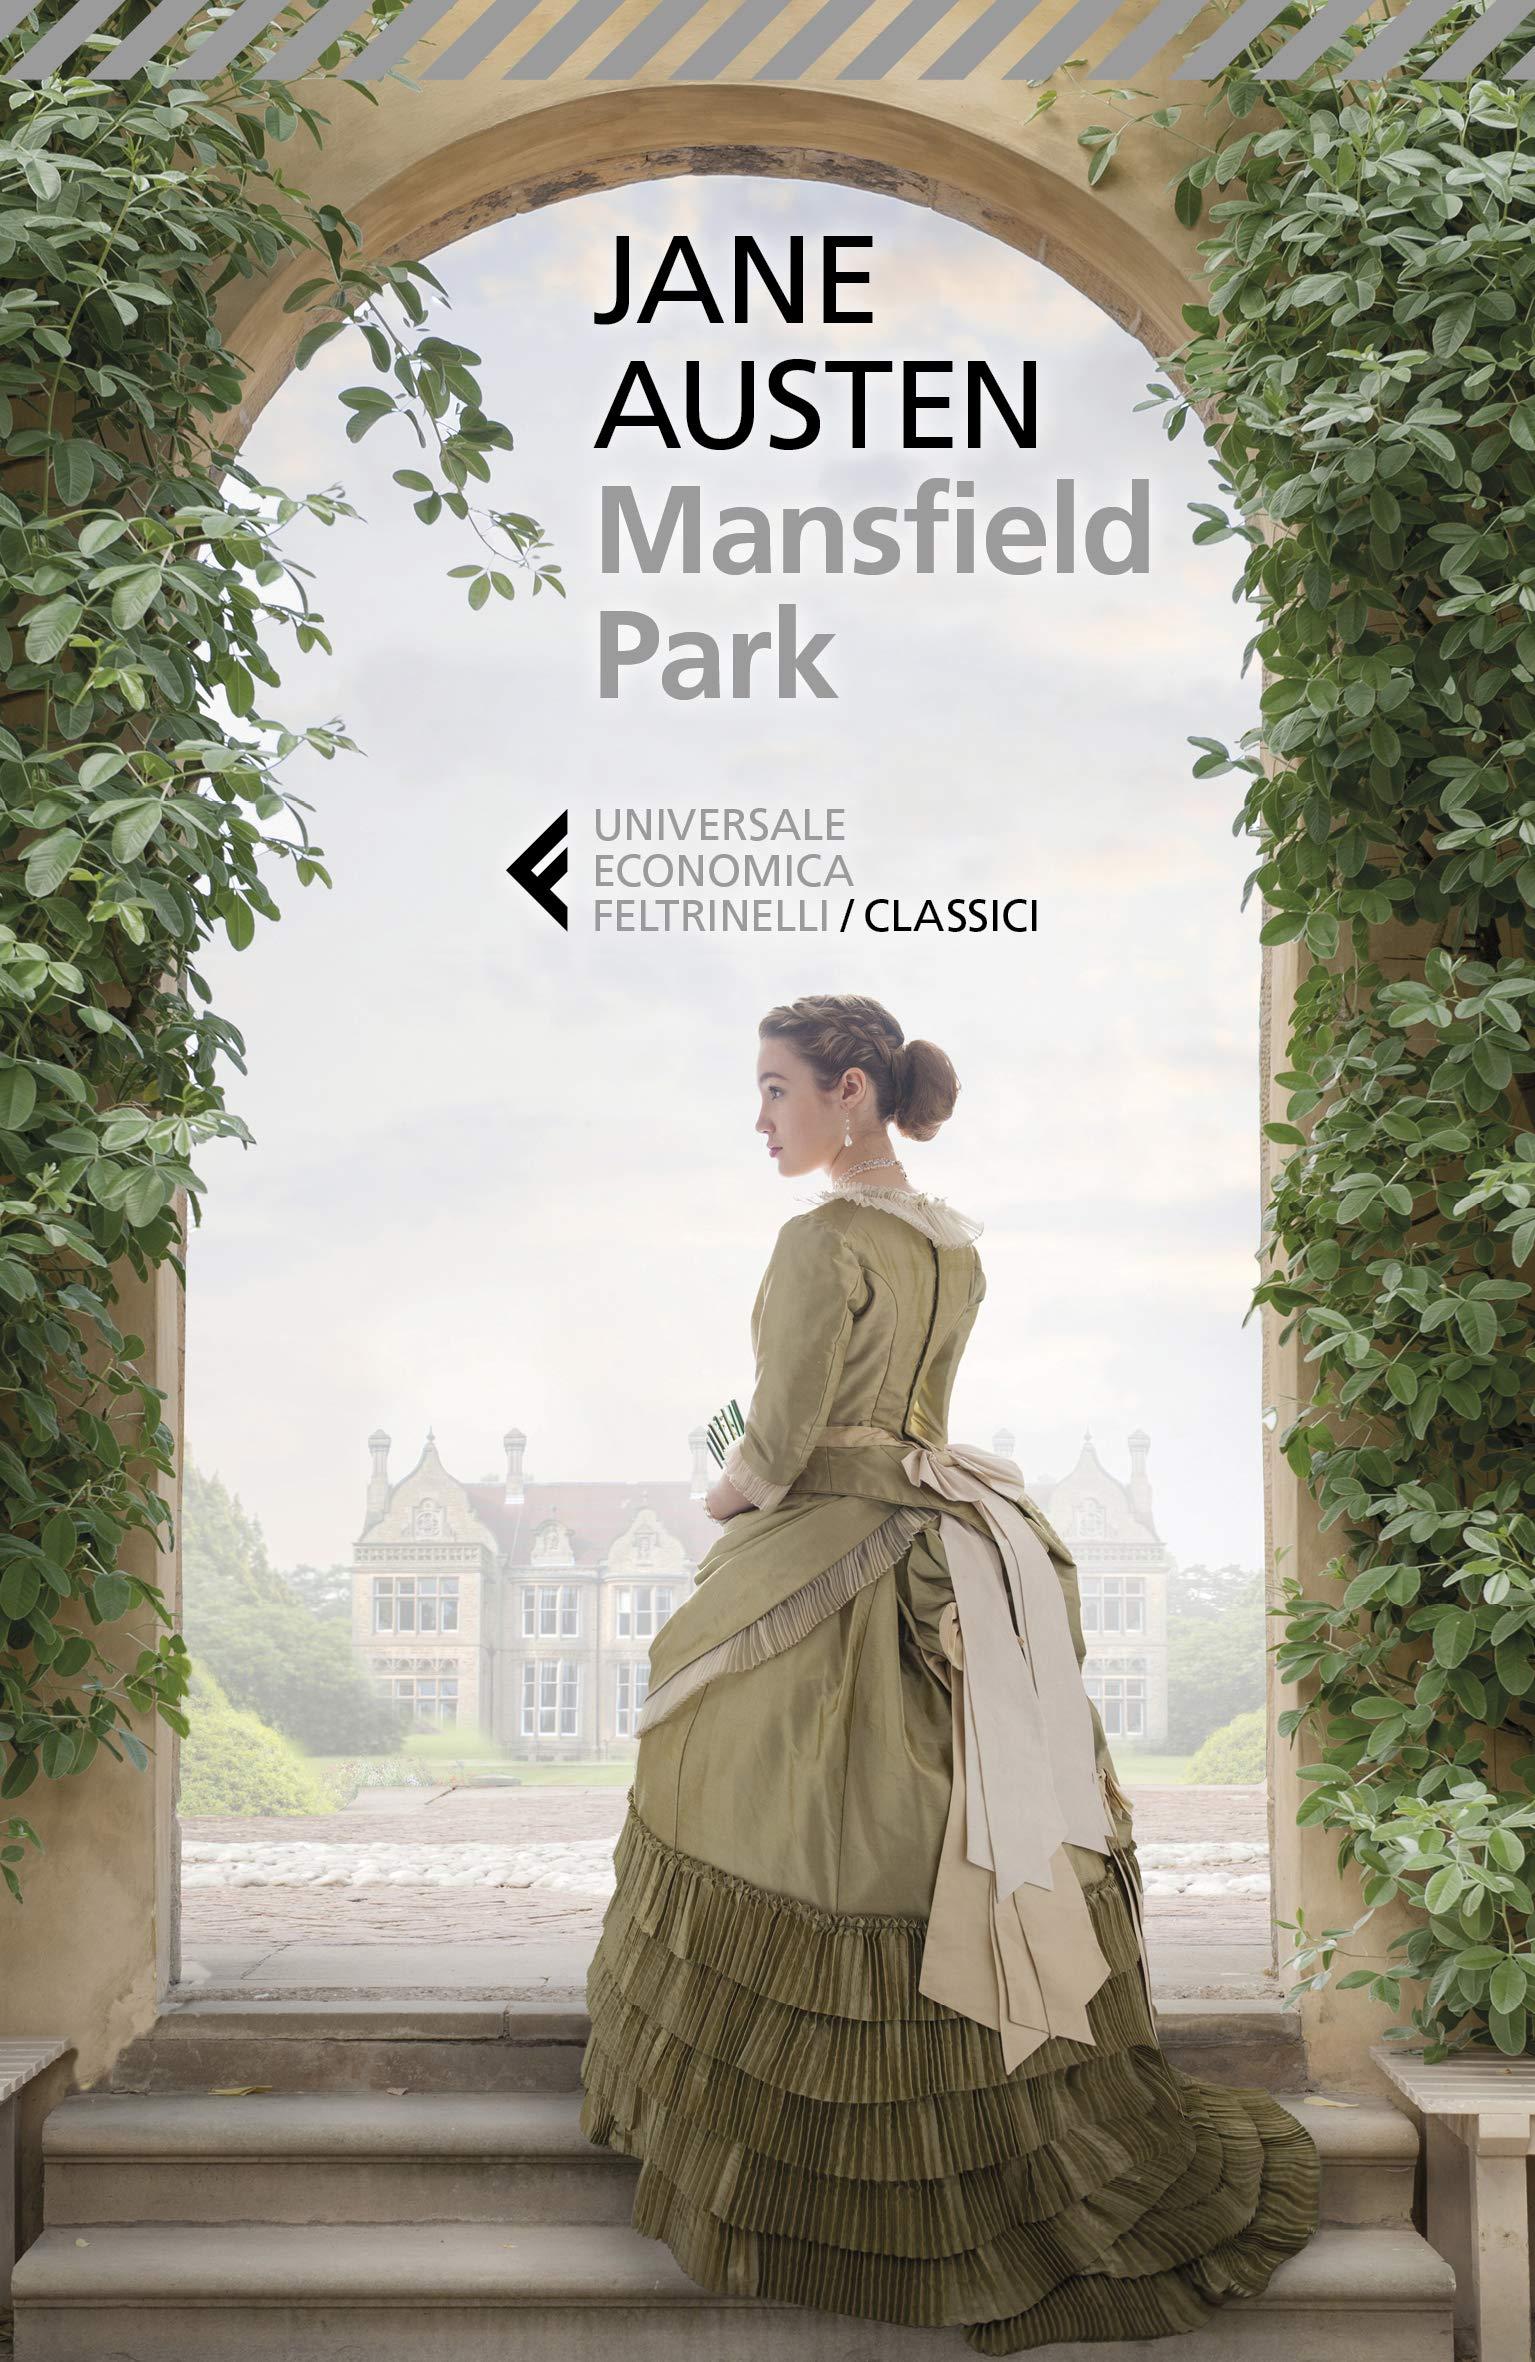 Amazon.it: Mansfield Park - Austen, Jane, Montanaro, Giovanni, Amato, Bruno  - Libri